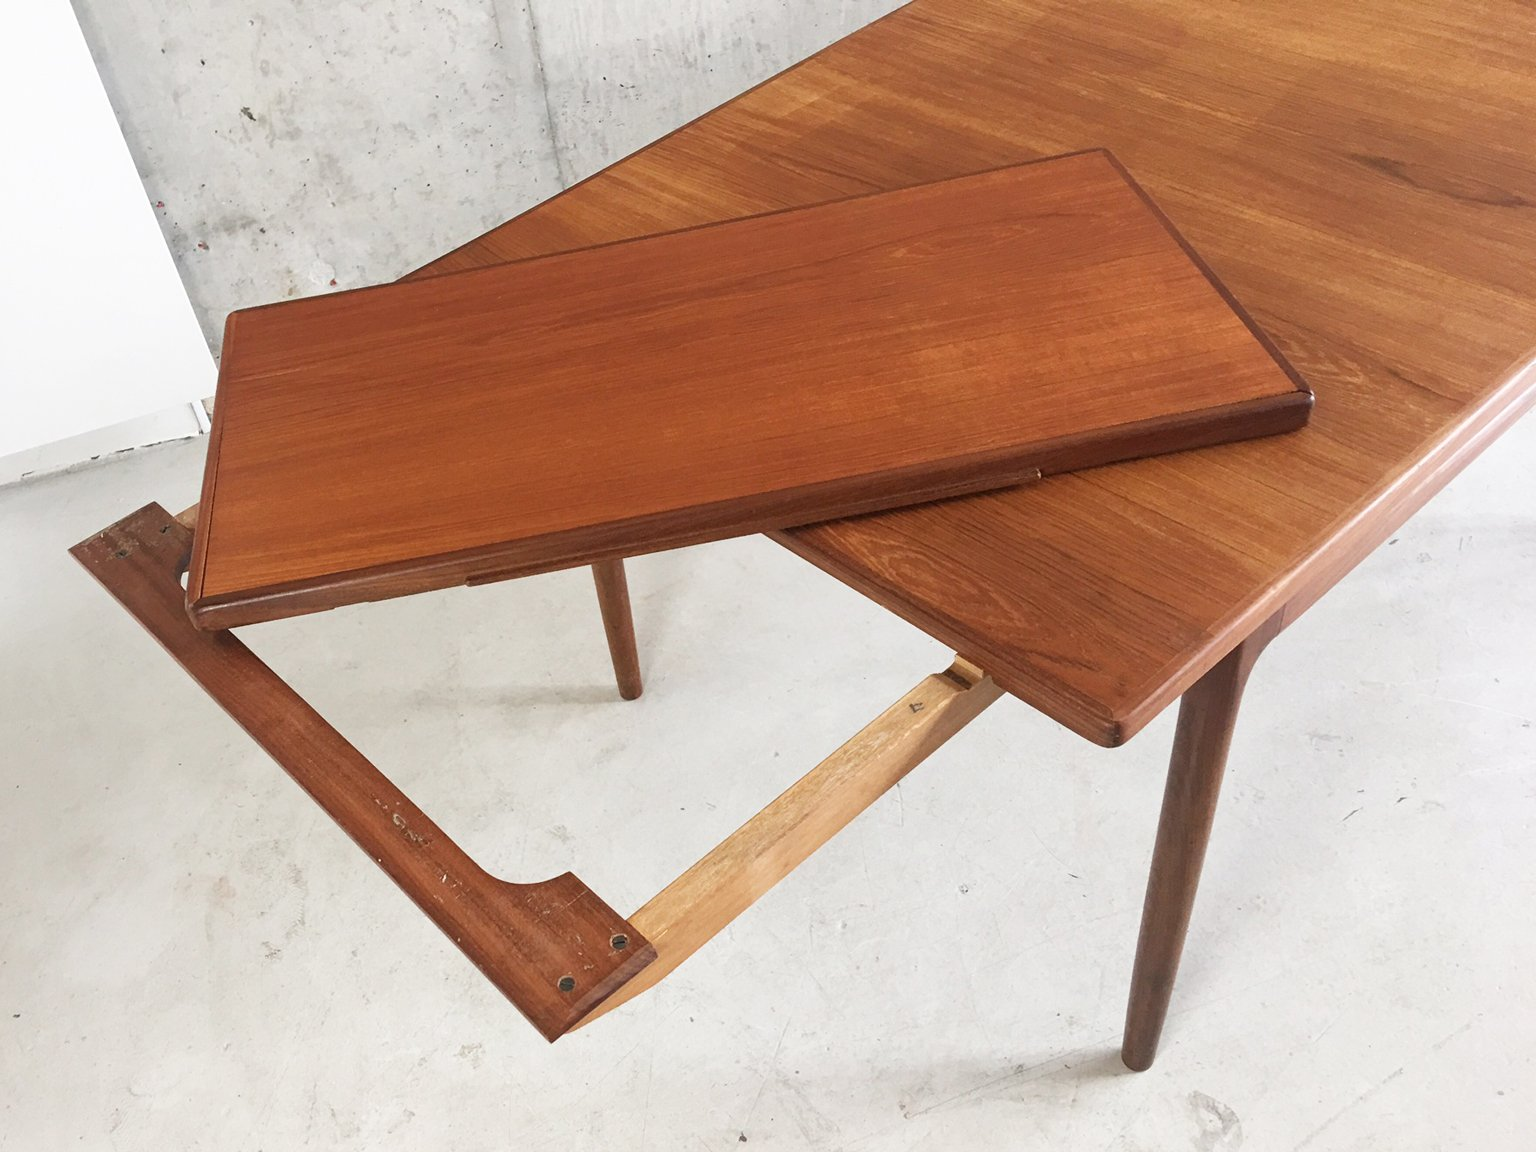 Teak Extendable Dining Table by Ib Kofod Larsen for G Plan  : teak extendable dining table by ib kofod larsen for g plan 1960s 5 from www.pamono.com size 1536 x 1152 jpeg 928kB